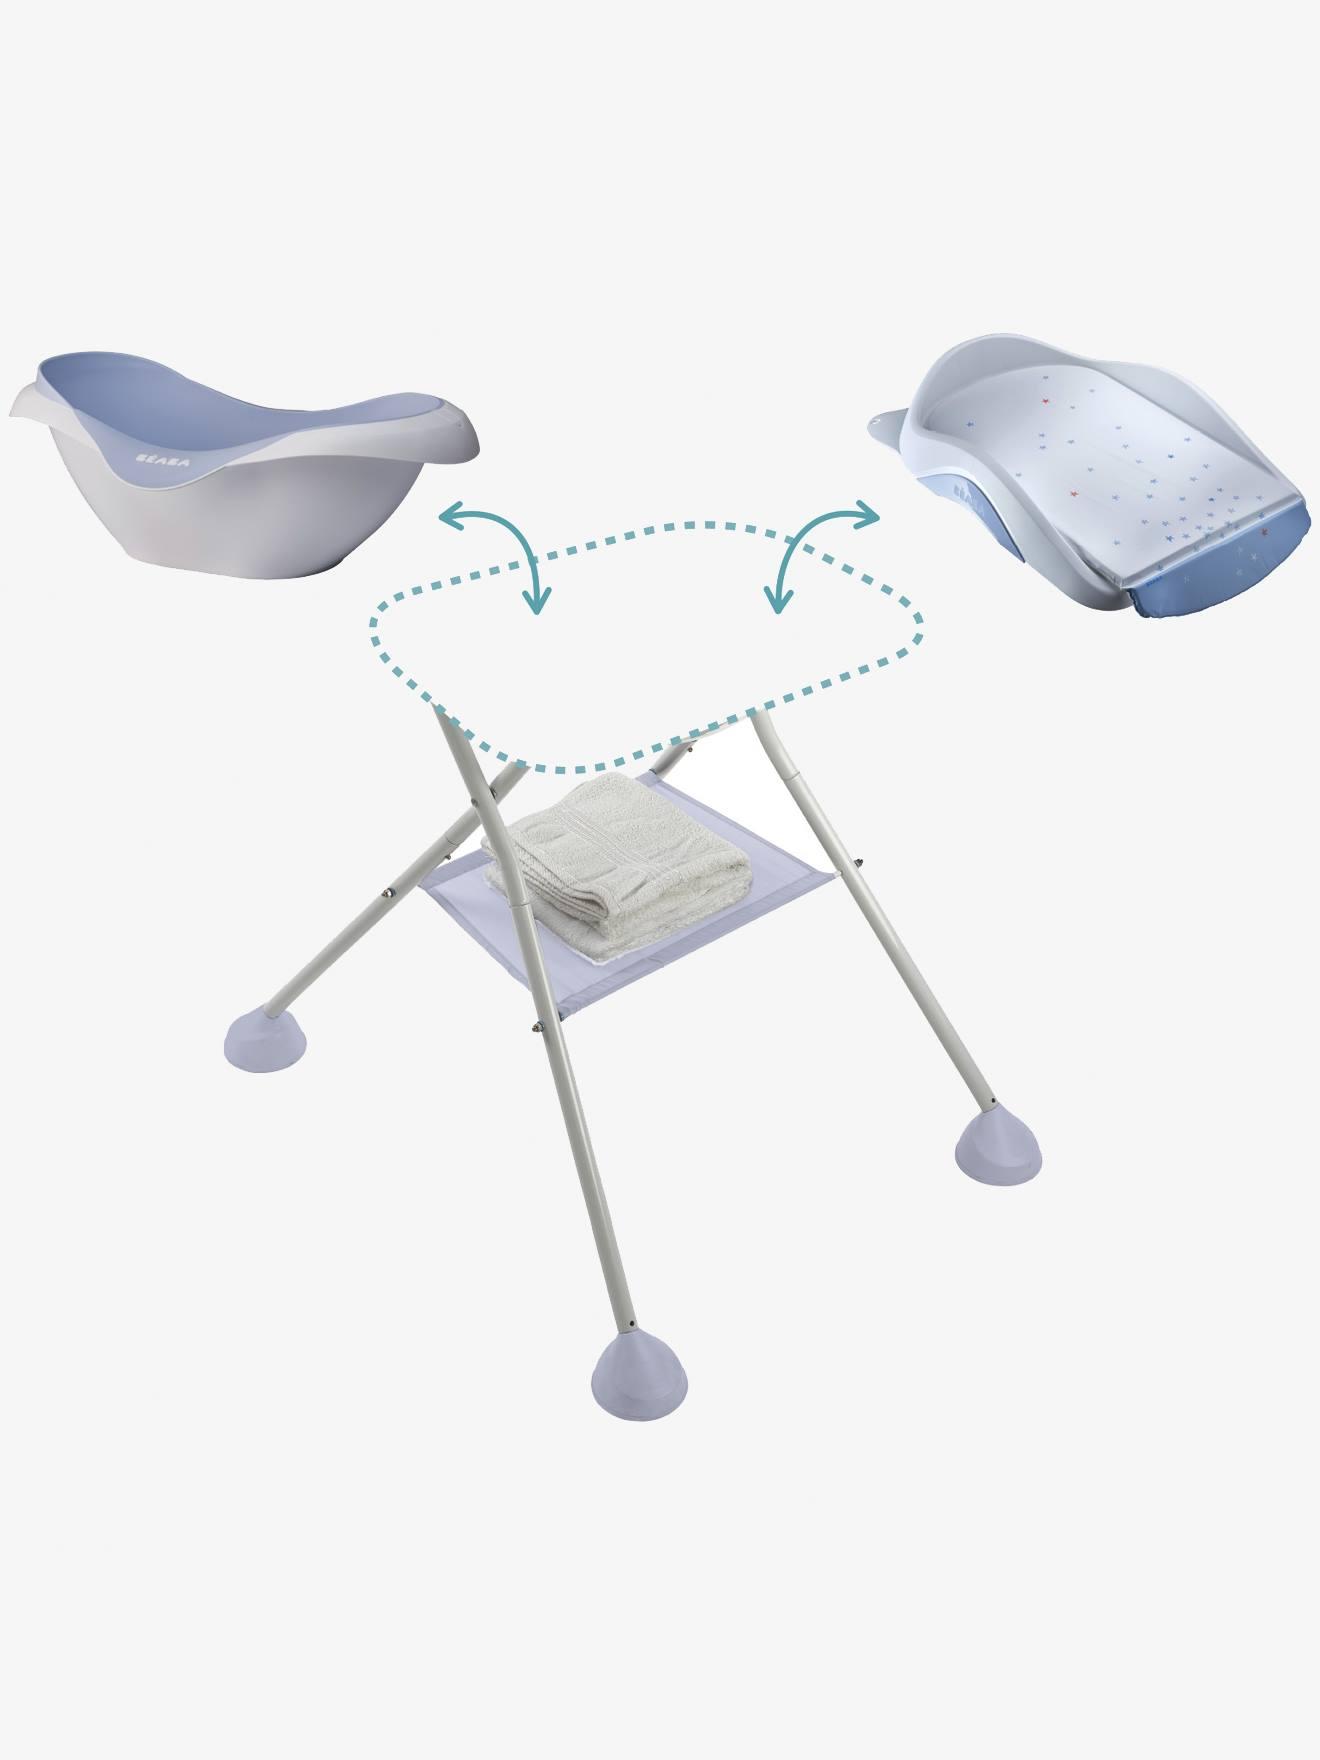 meilleur de transat de bain cameleo id es de bain de soleil. Black Bedroom Furniture Sets. Home Design Ideas